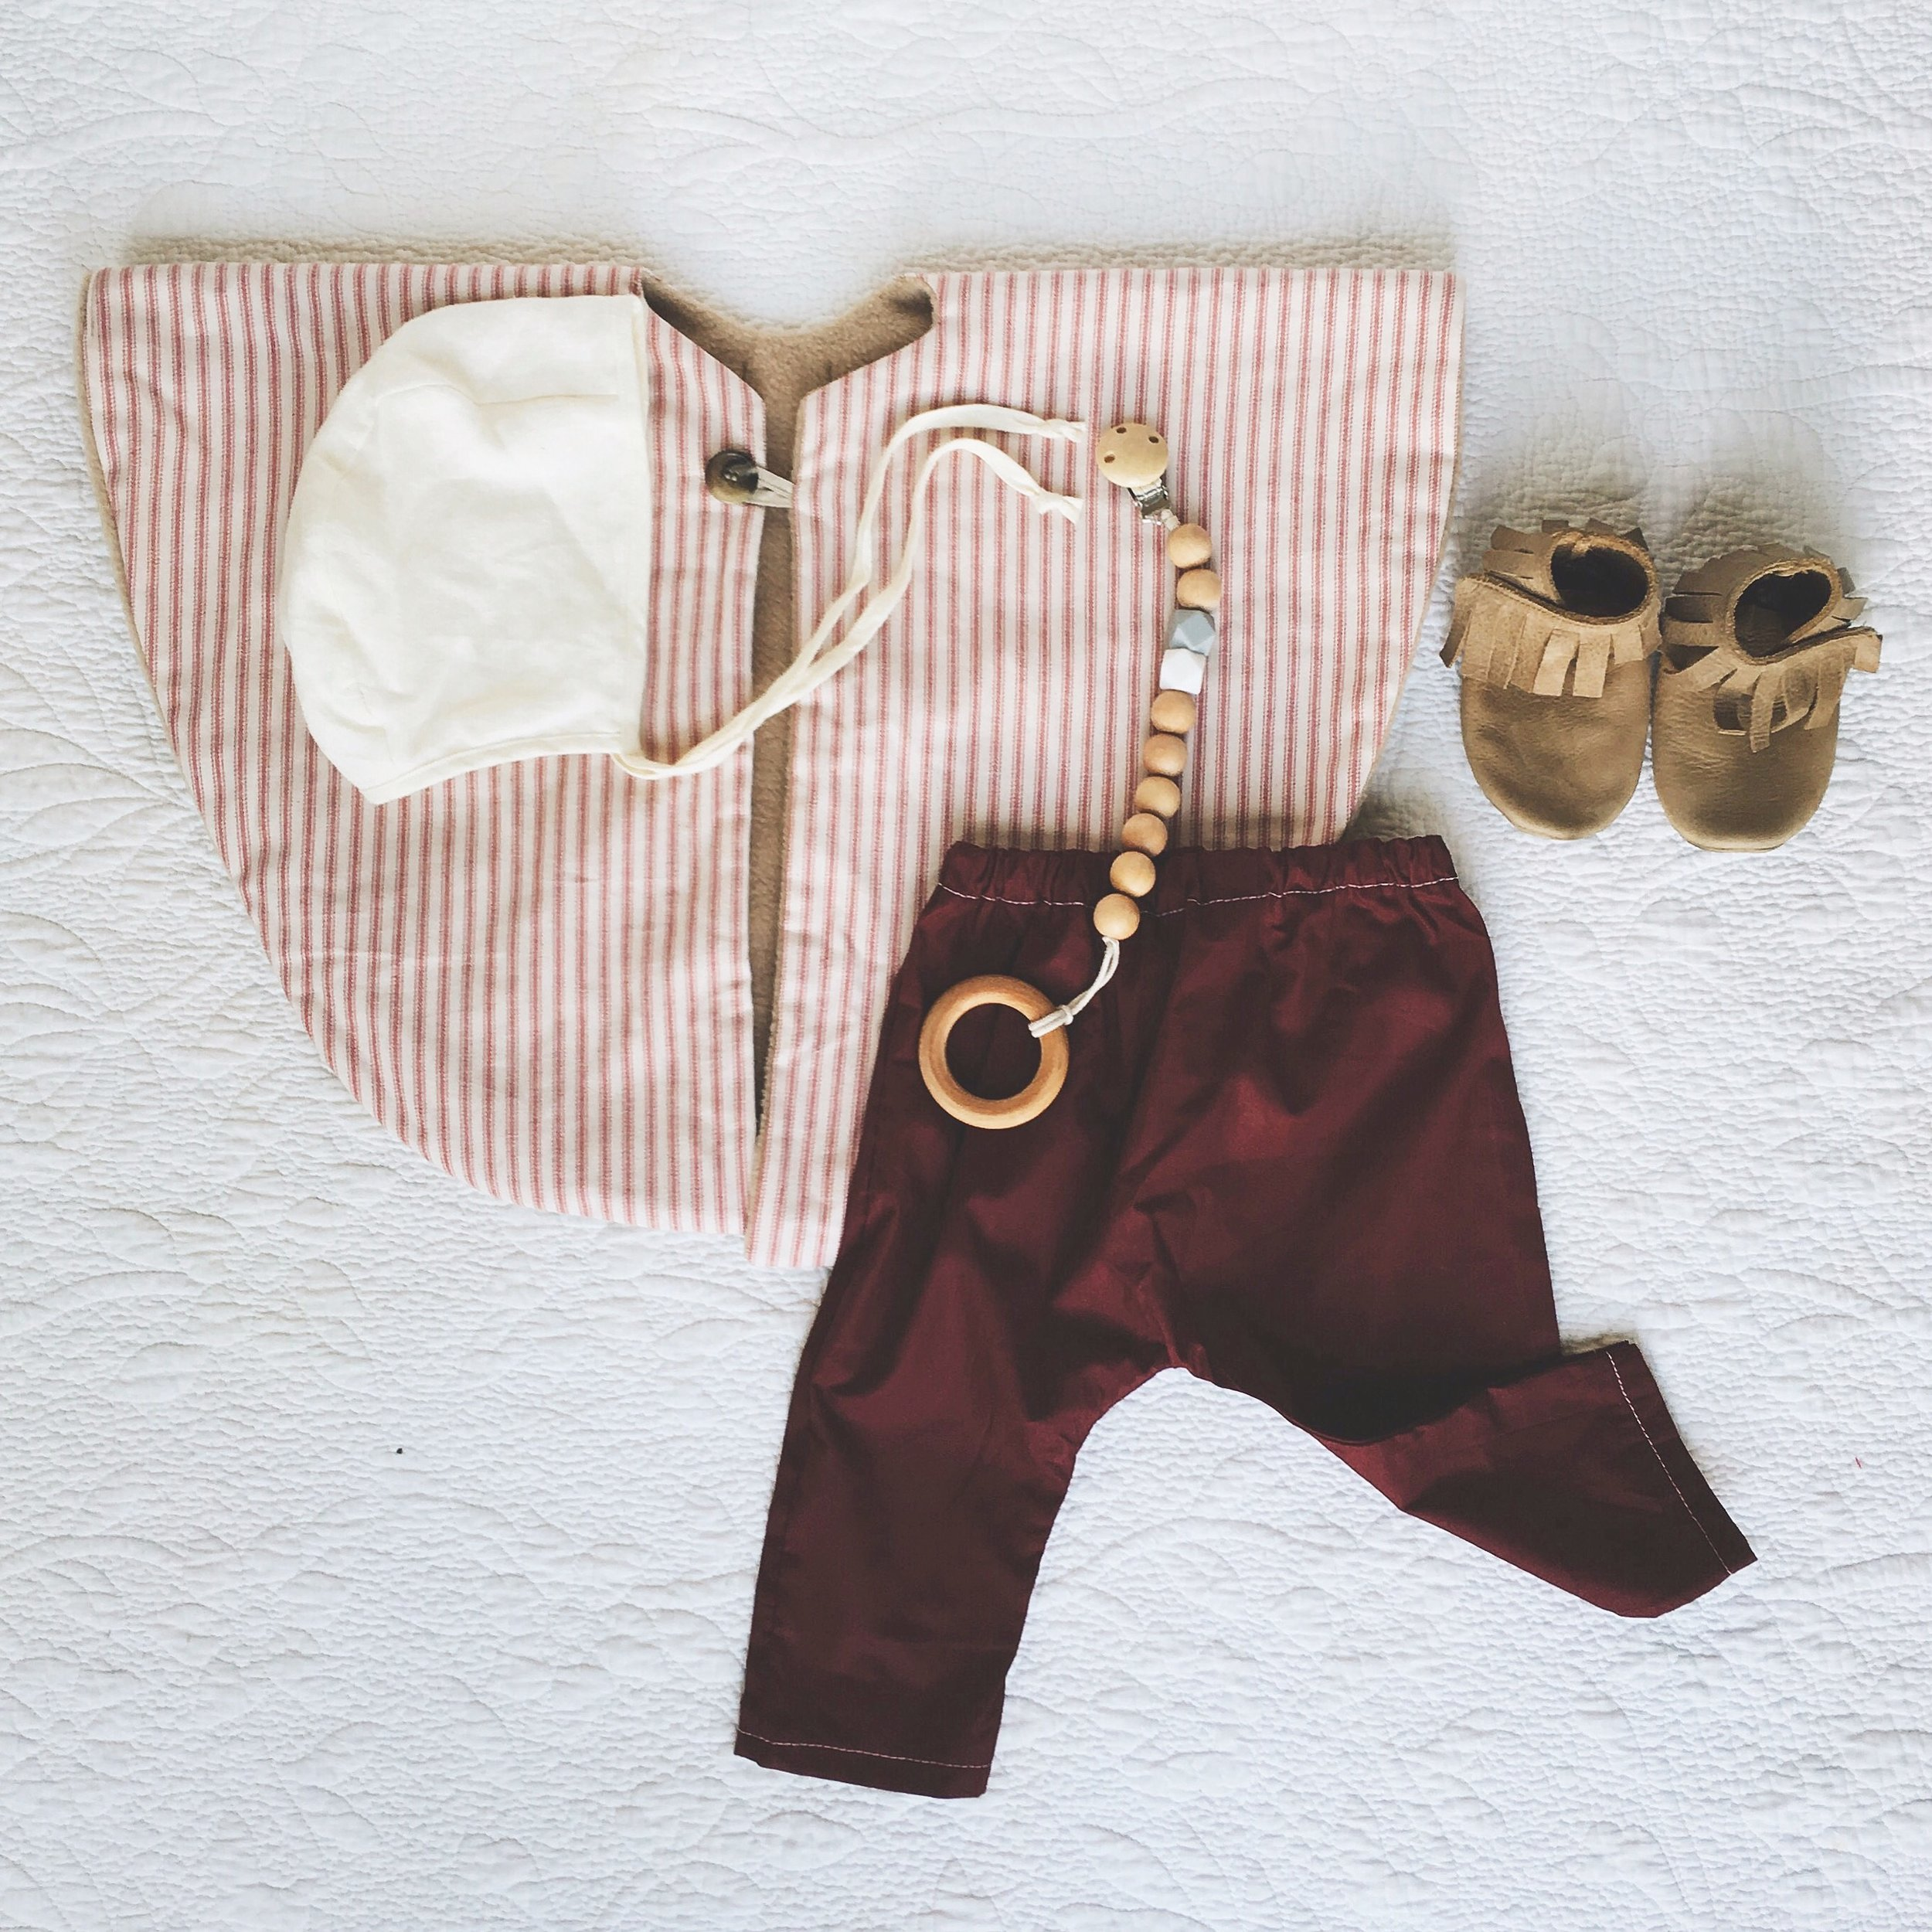 Fleece Cape c/o  Foothill Fawn  ;  Harem Pants  c/o  Little A Handmade  ;  Bonnet  -  Briar Handmade  ; Moccasins c/o  Ulla +Viggo  ;  Pacifier Clip  c/o  Wild Creek Co